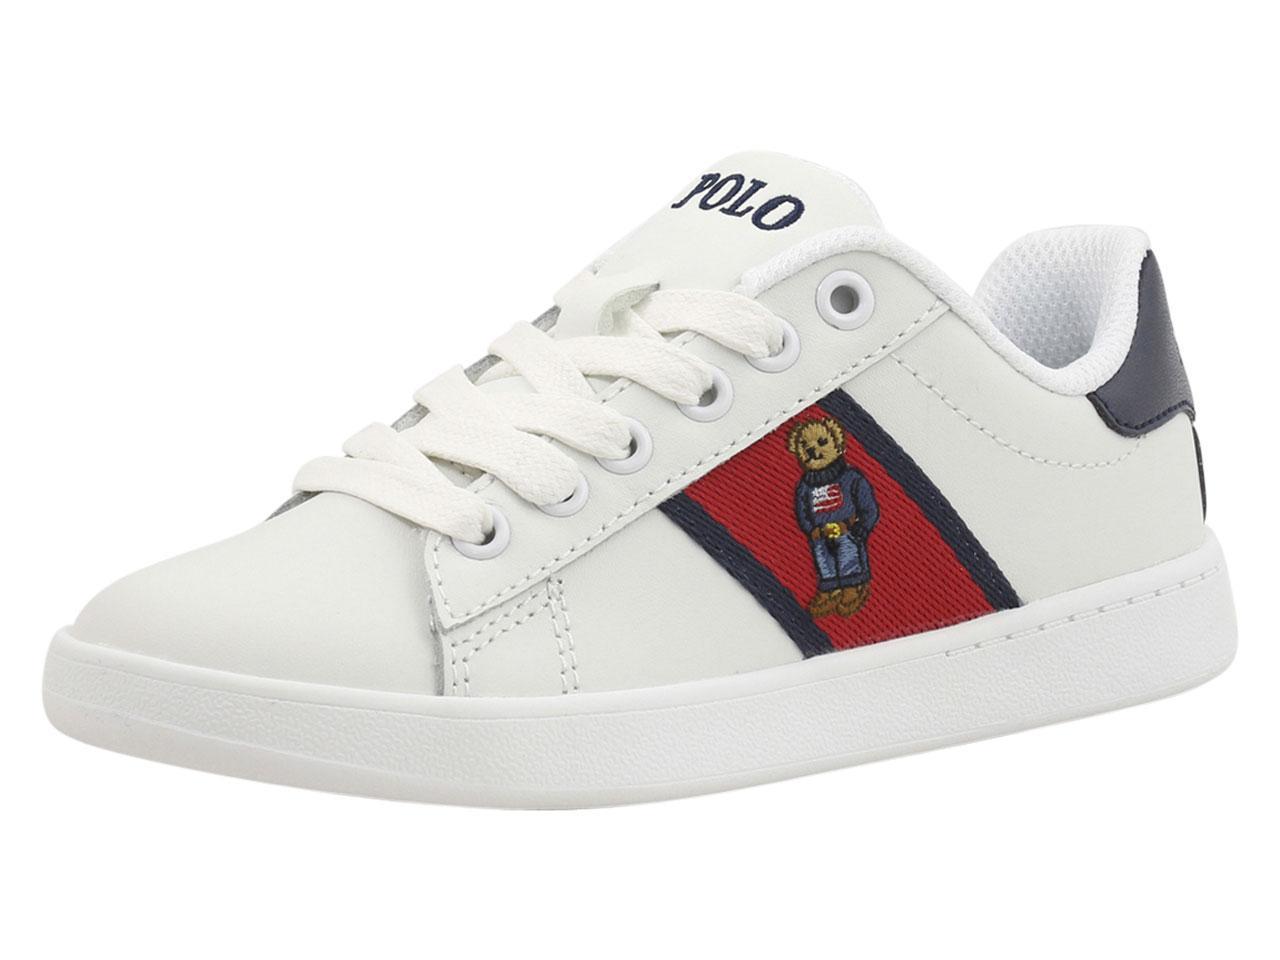 3bf0cf5a76a Polo Ralph Lauren Little Big Boy s Quilton Bear Sneakers Shoes